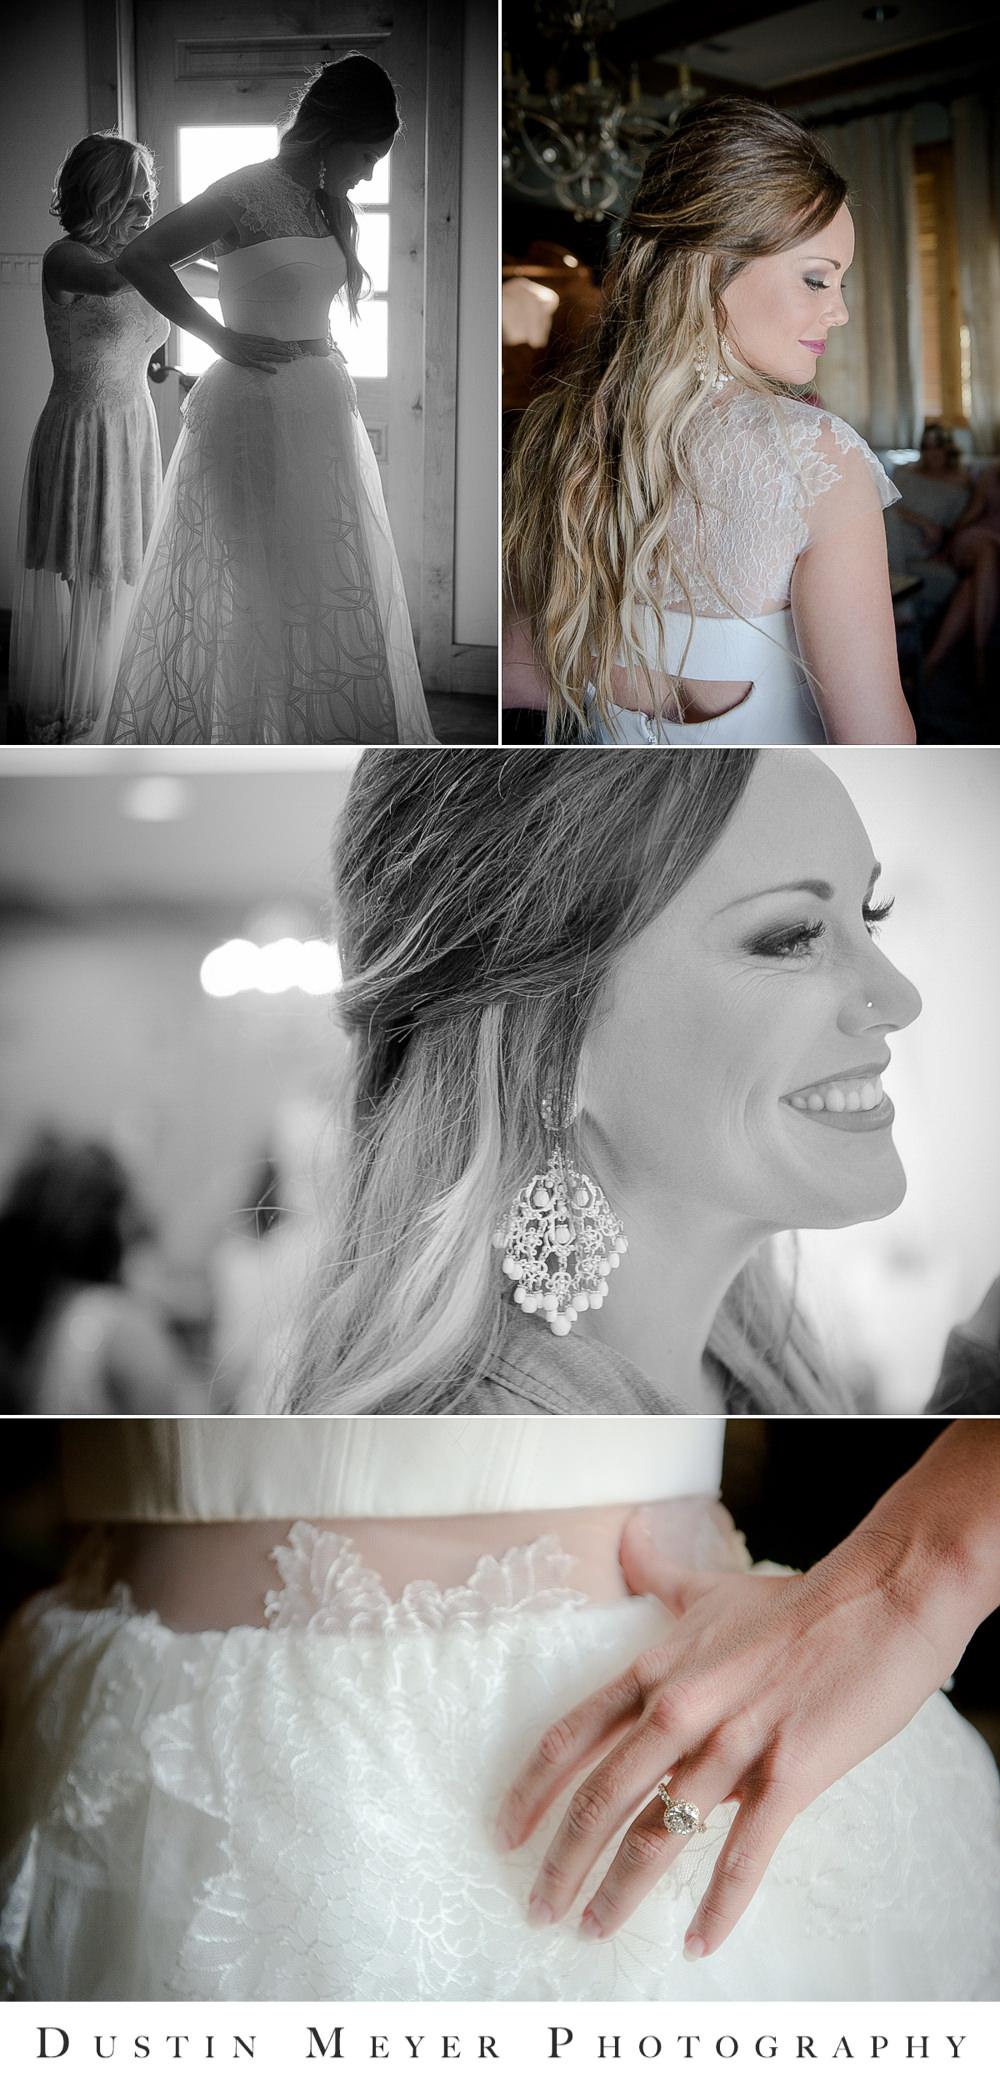 bridal gown, wedding dress, getting ready photos, engagement ring, wedding makeup, wedding earrings